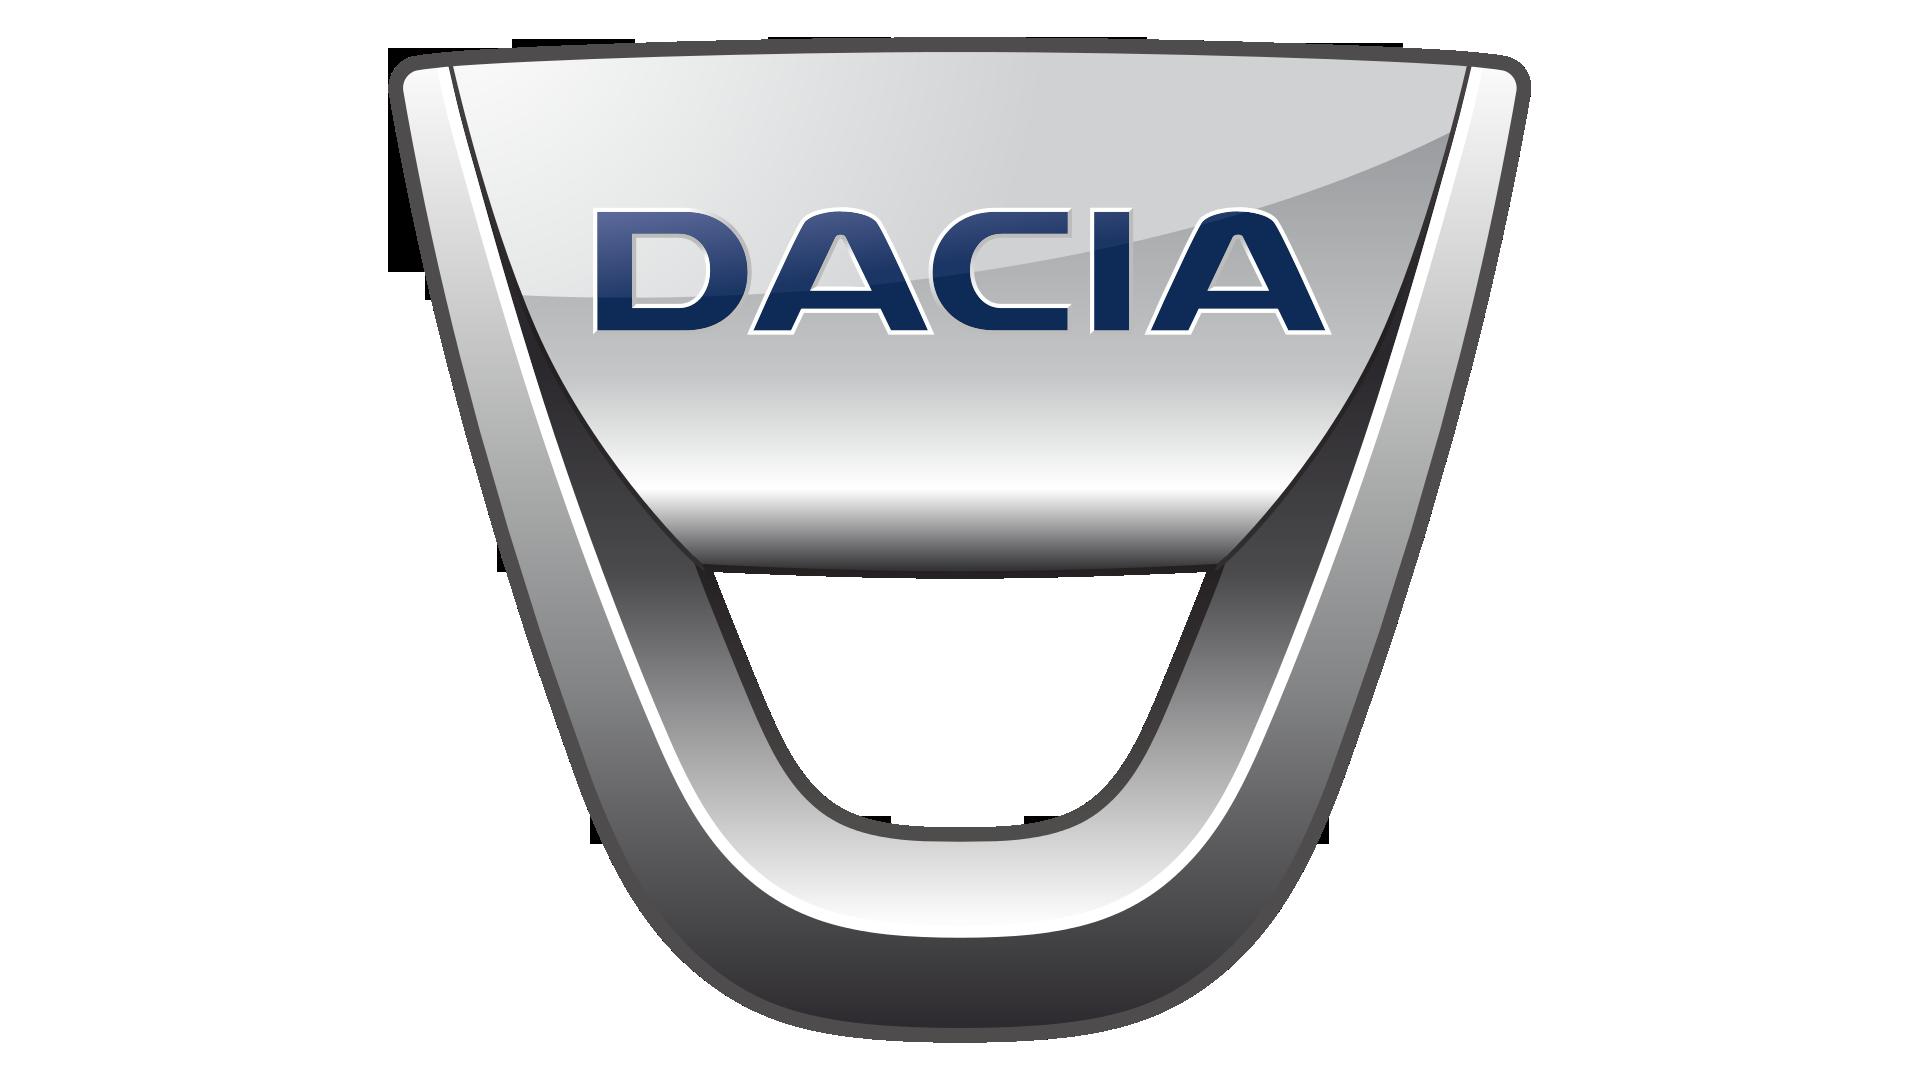 dacia logo hd png information carlogosorg